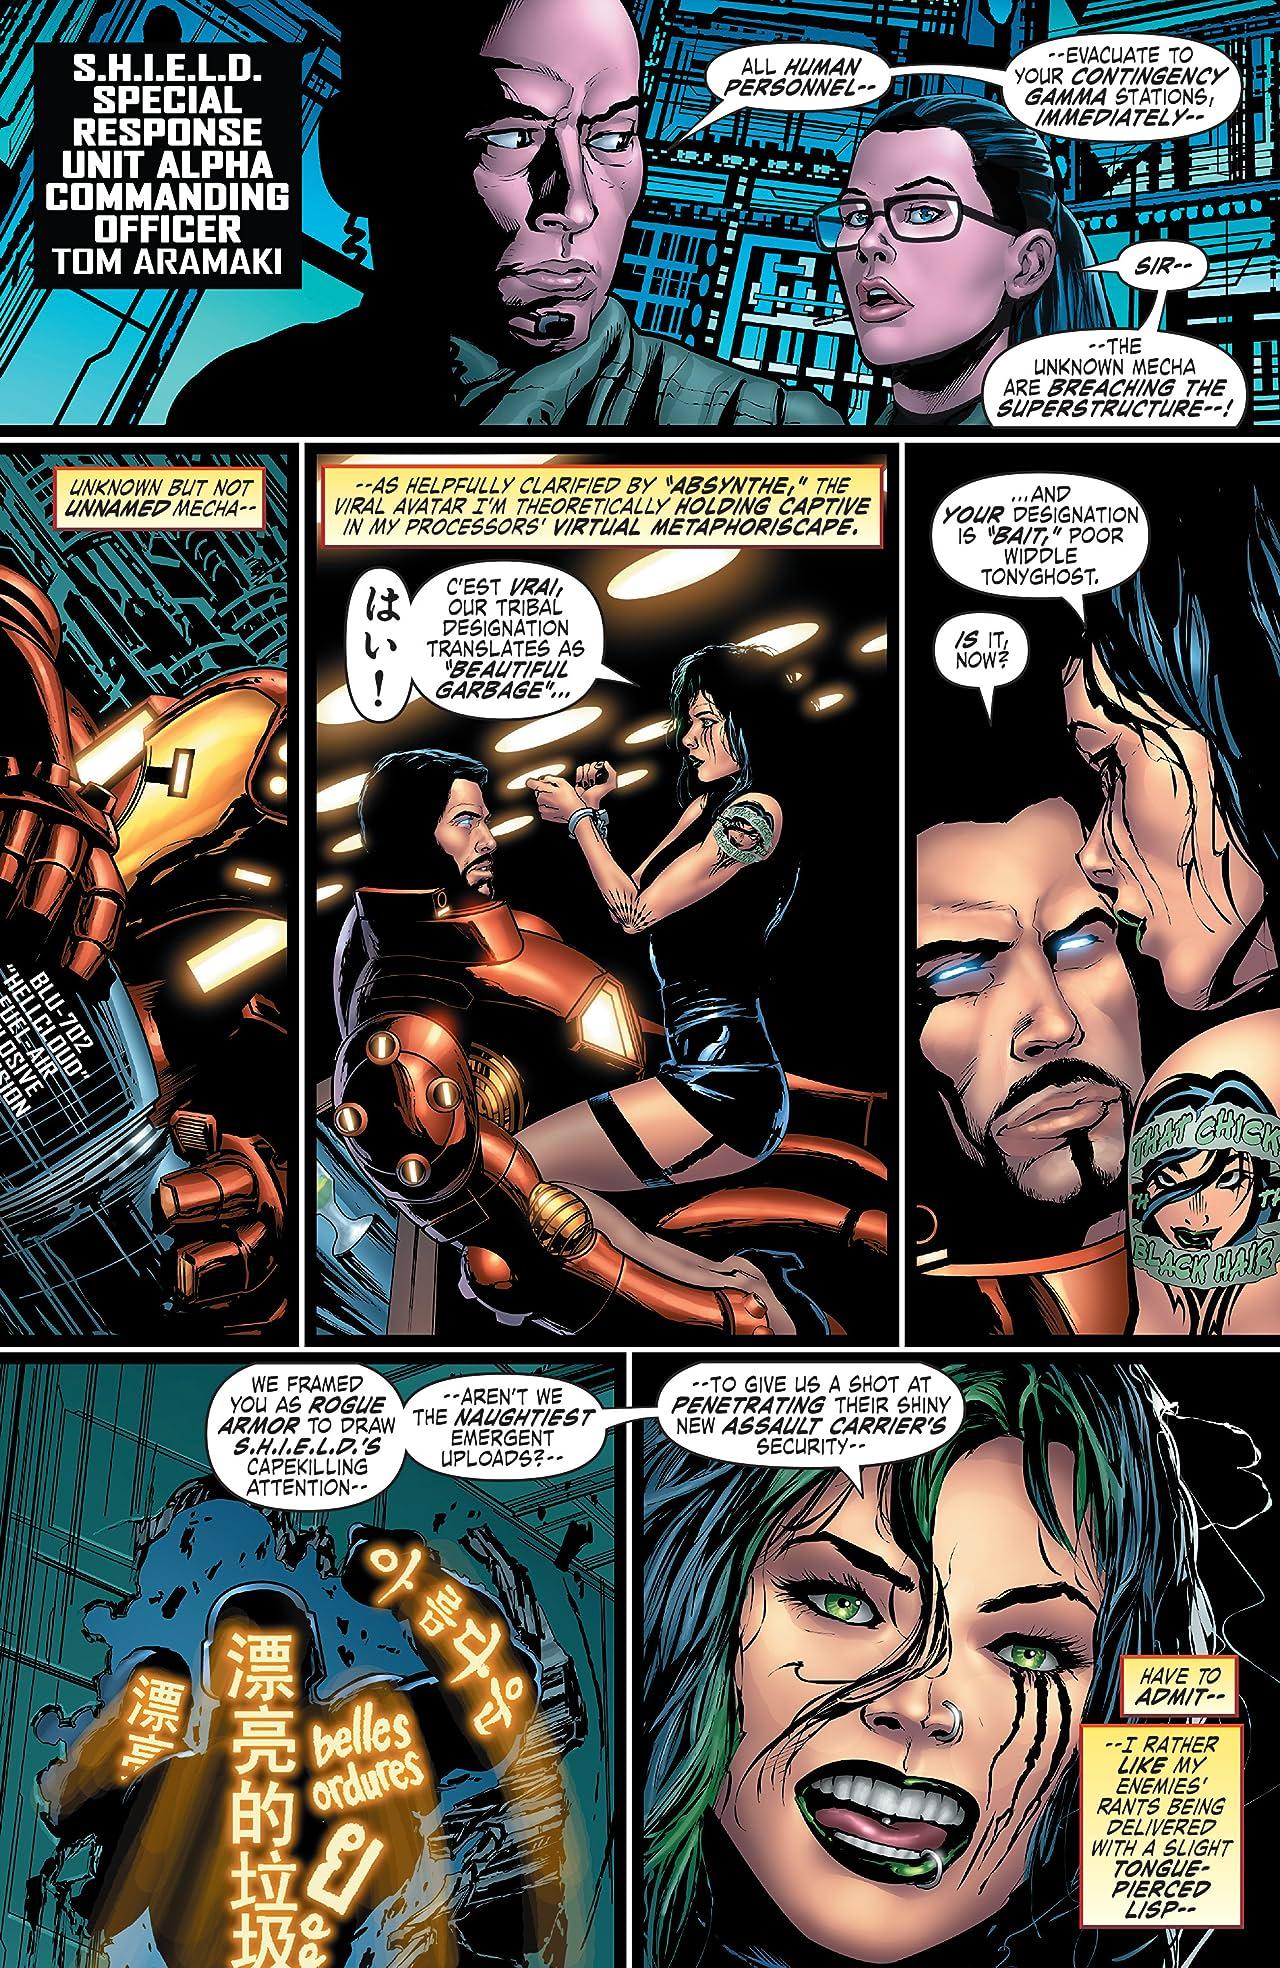 Iron Man: Hypervelocity (2007) #6 (of 6)